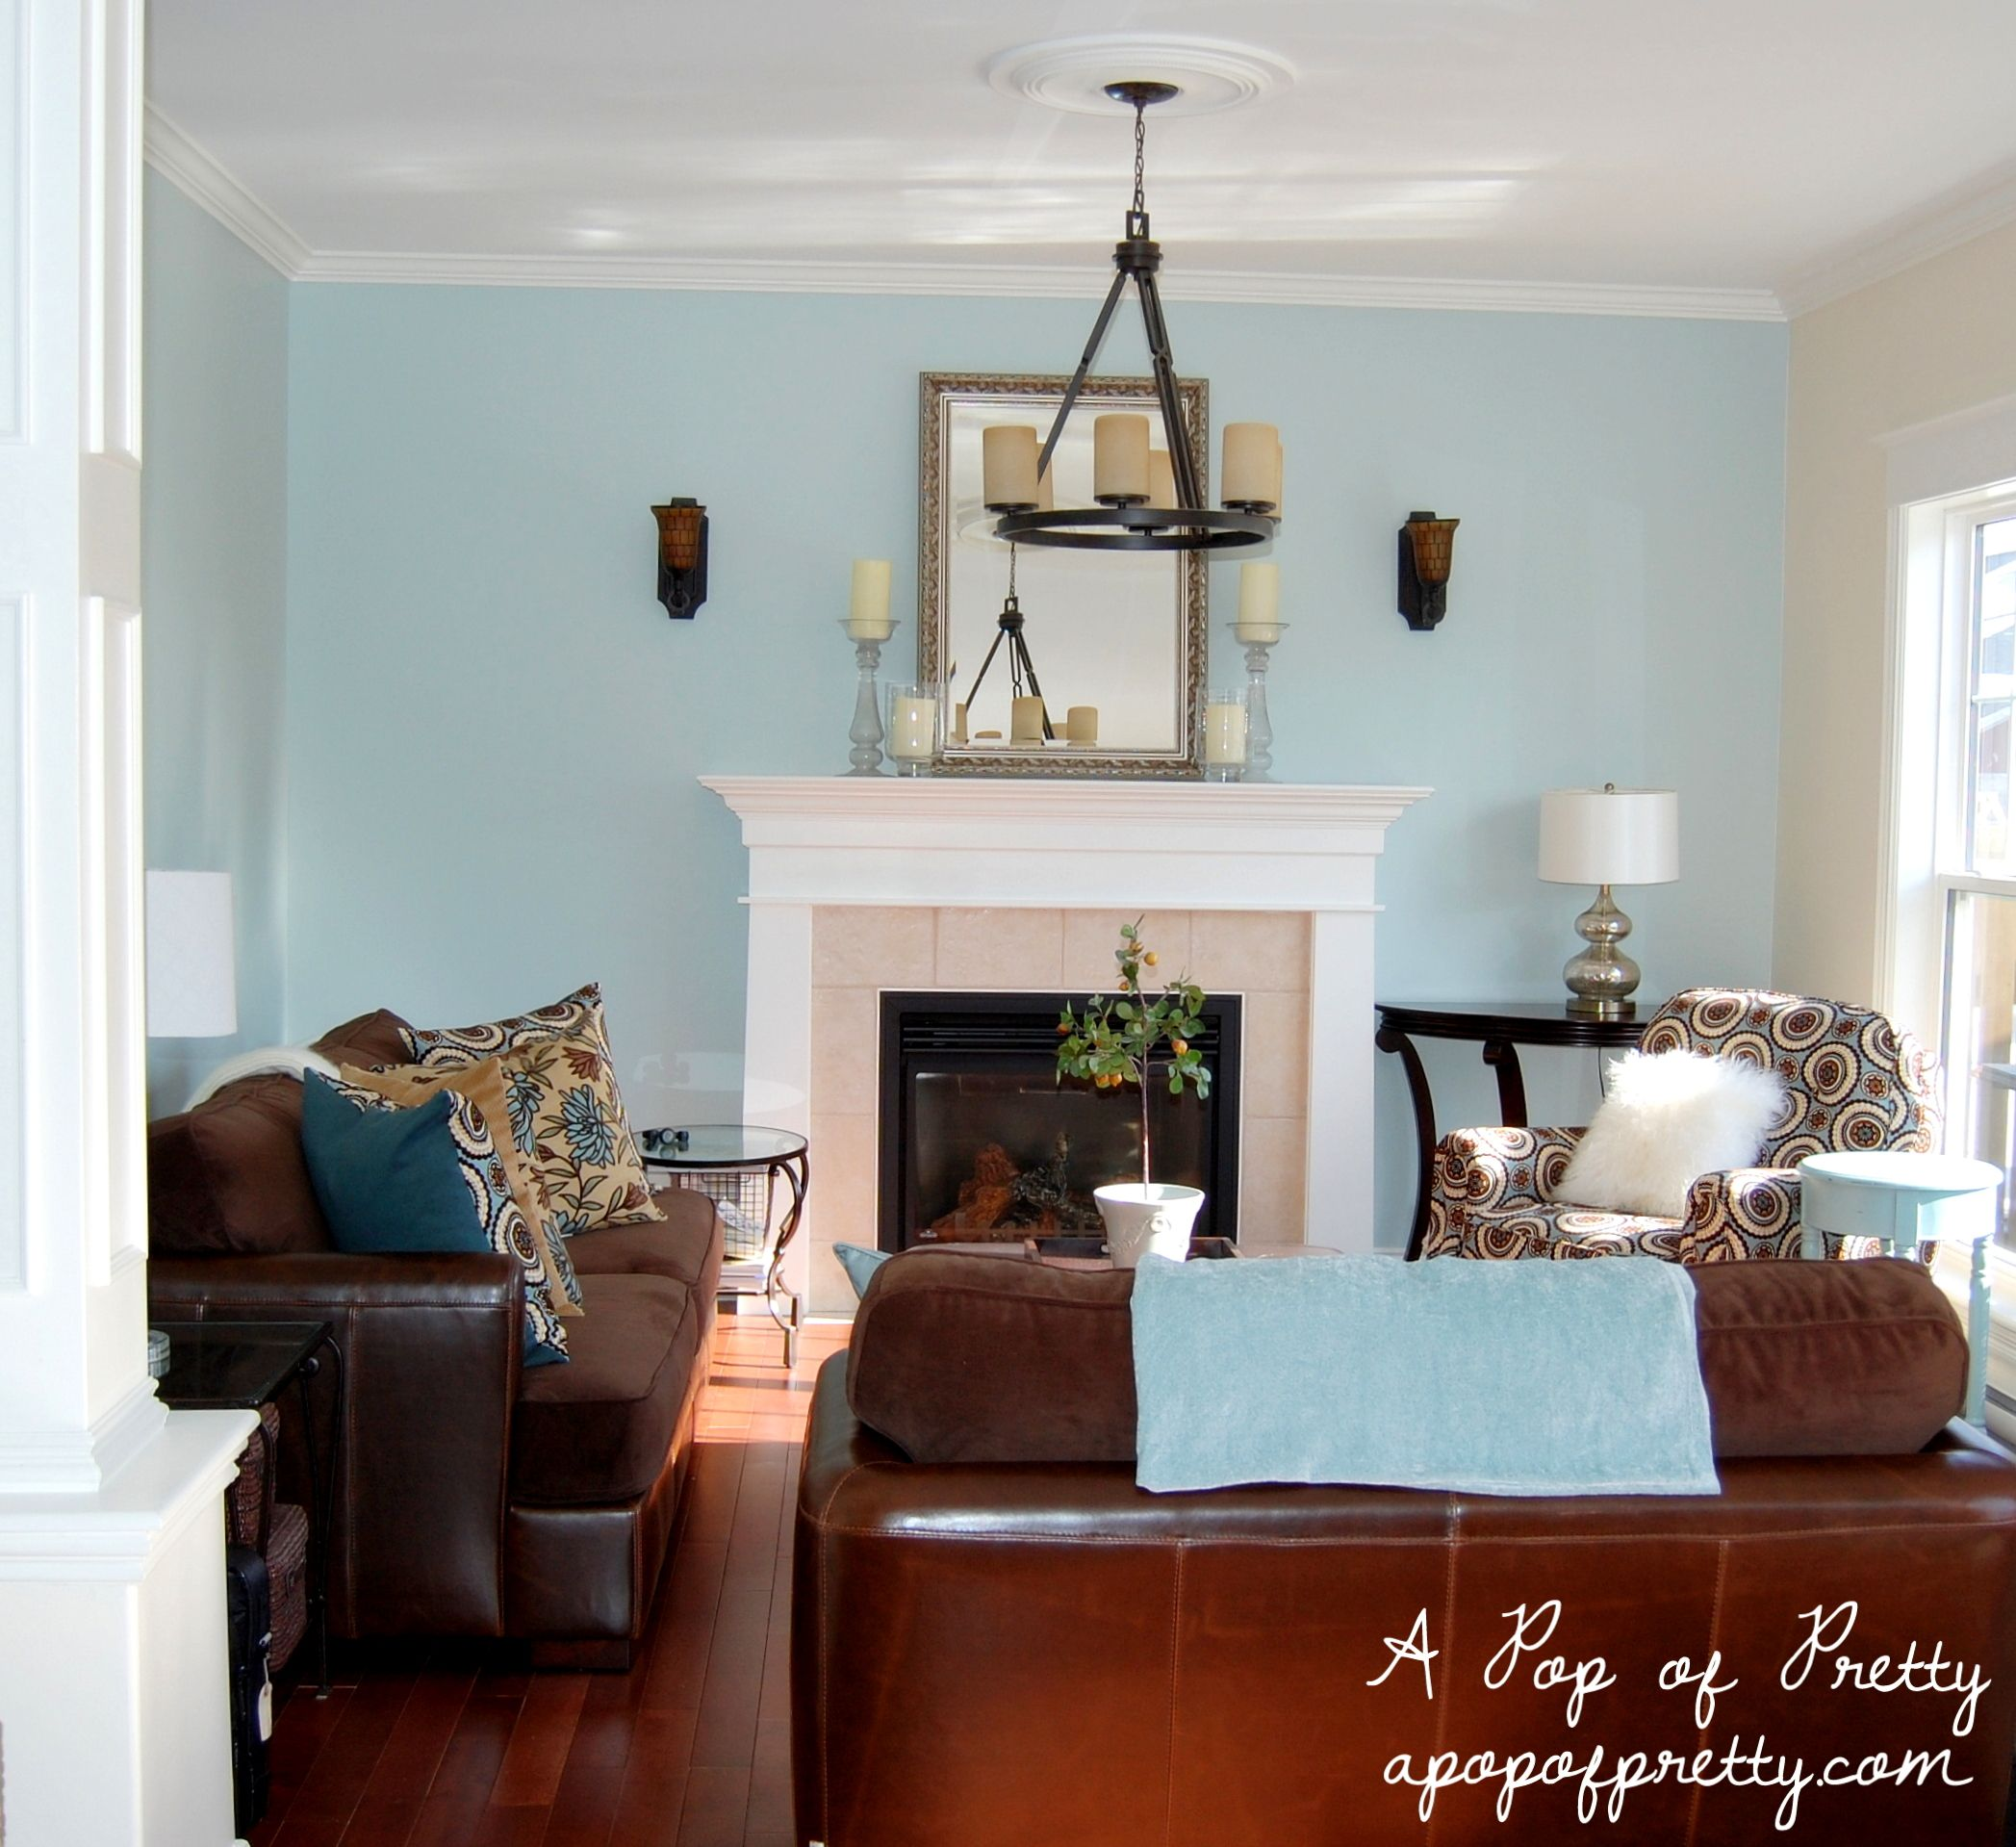 Woodlawn blue living room 2 gray living room walls woodlawn blue and grey living rooms - Blue and gray living room ...